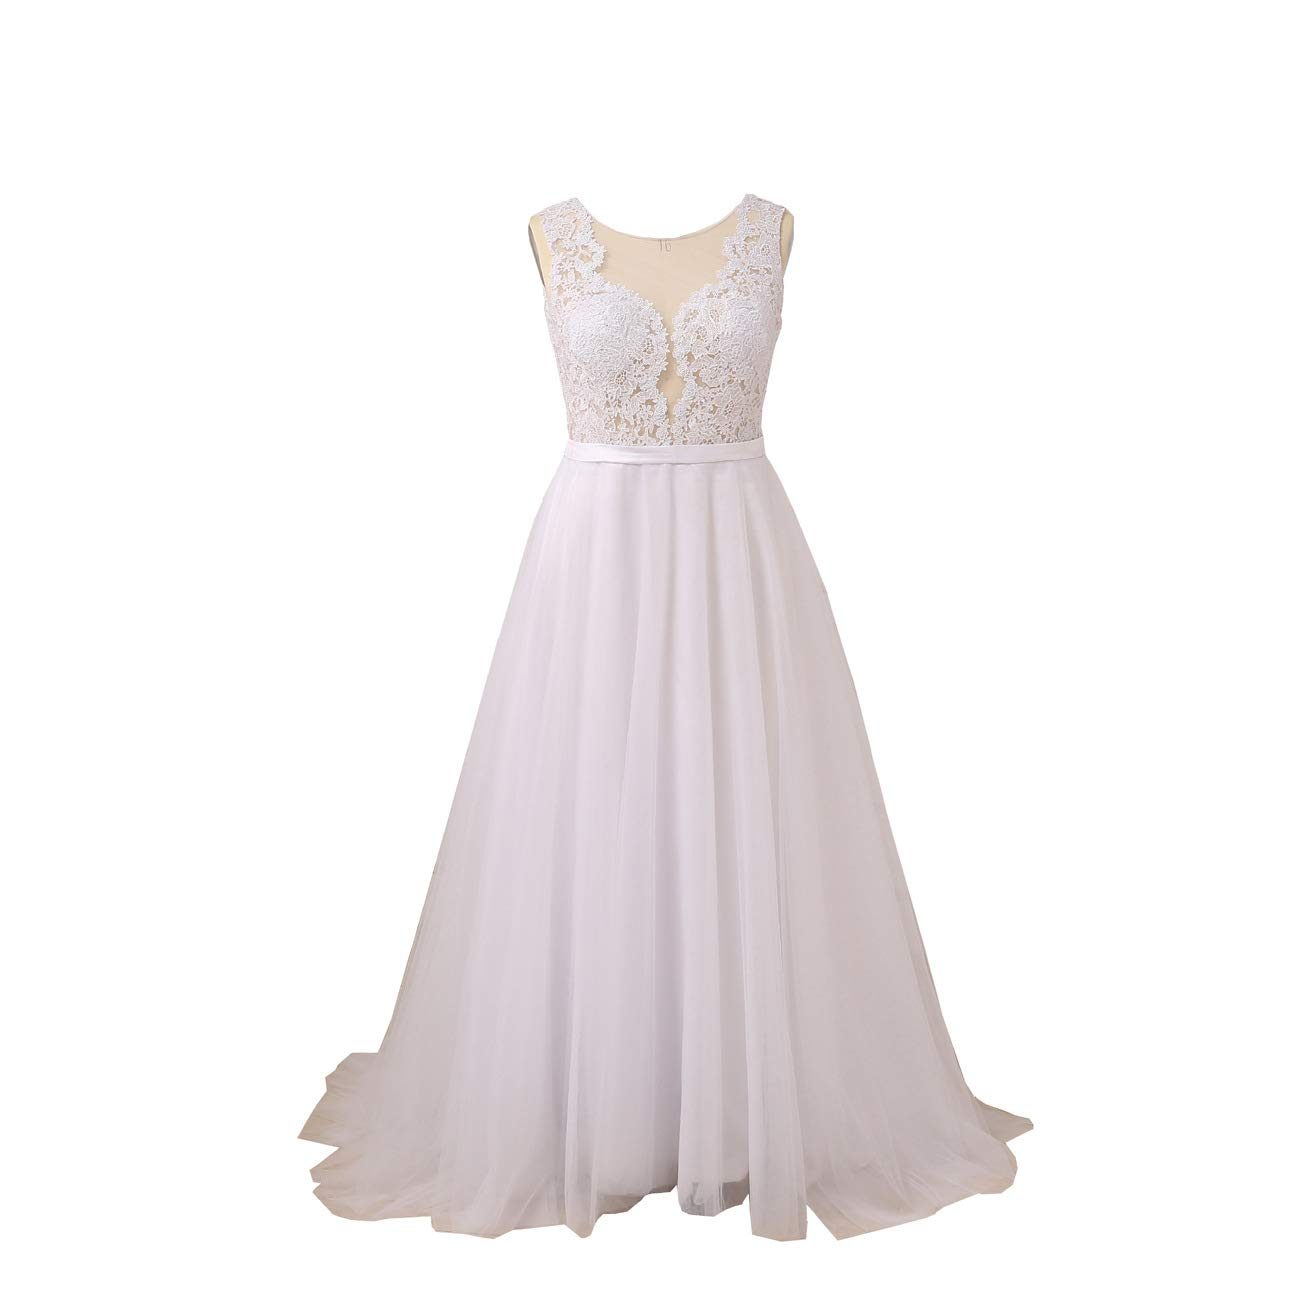 Yipeisha Womens Strapless Corset Plus Size Mermaid Wedding Dress